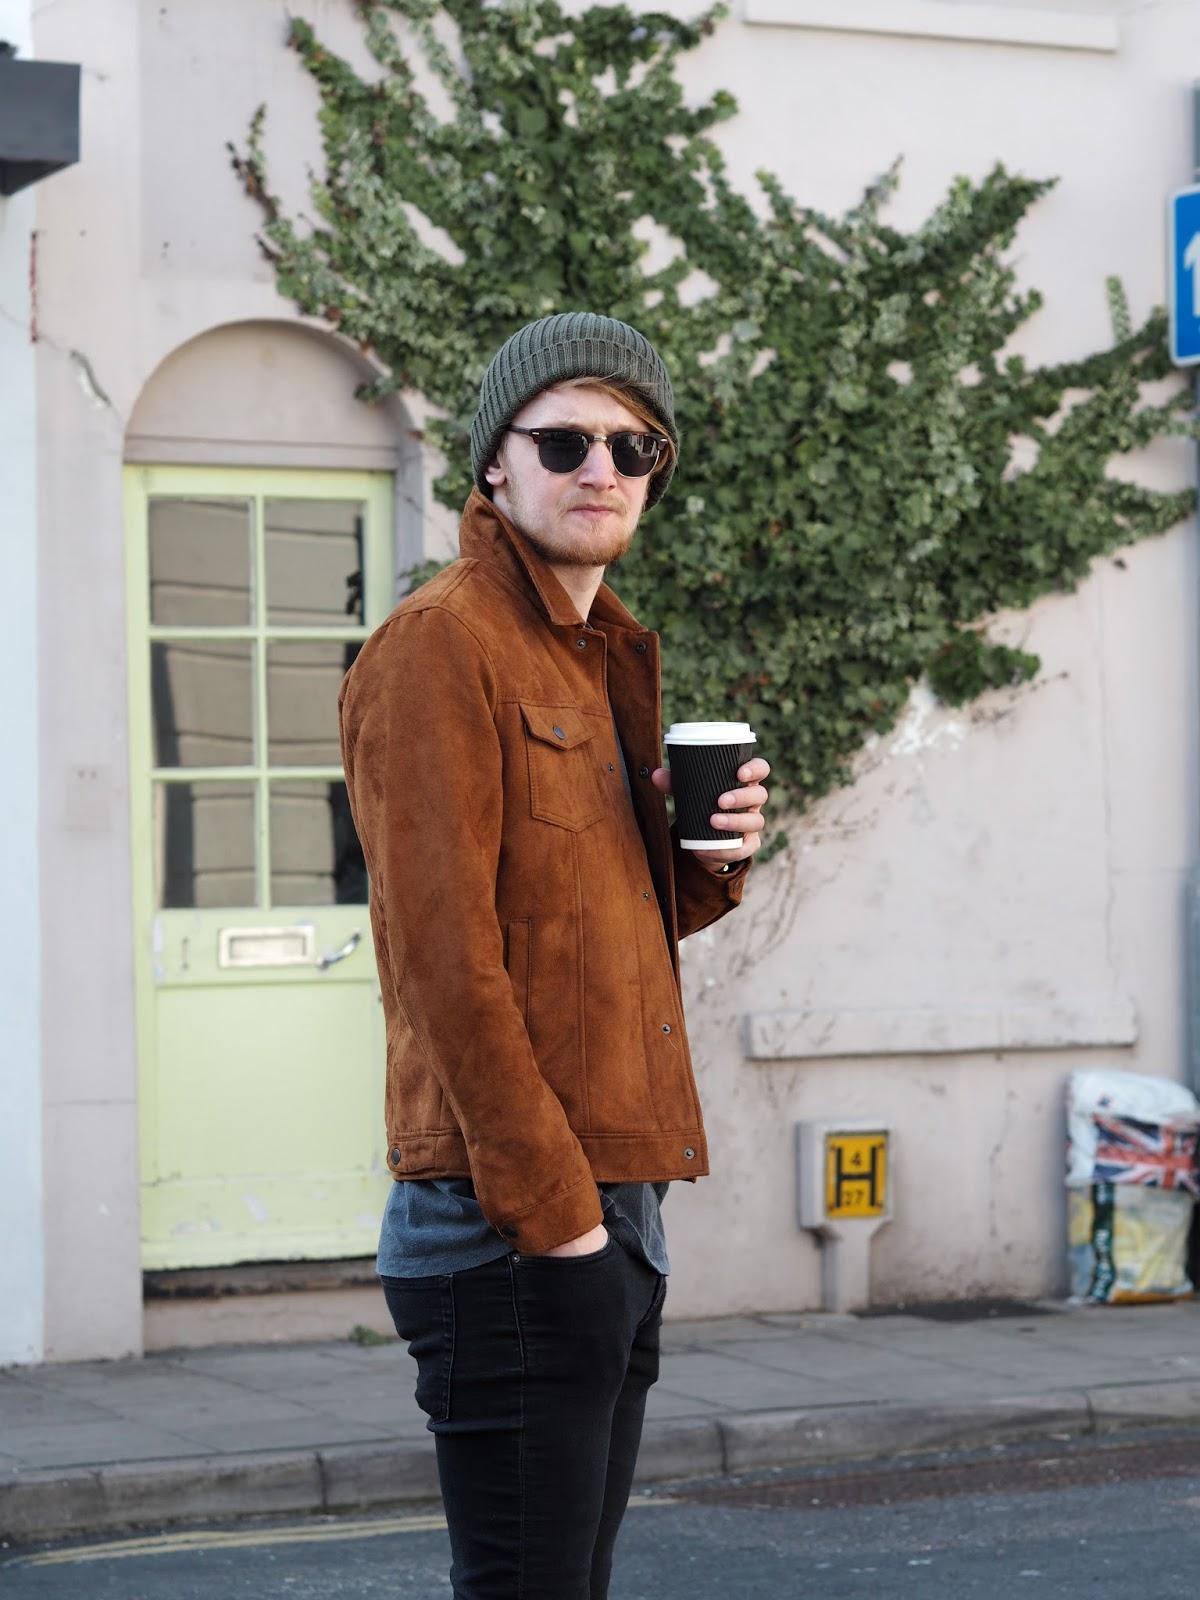 Henry drinking coffee